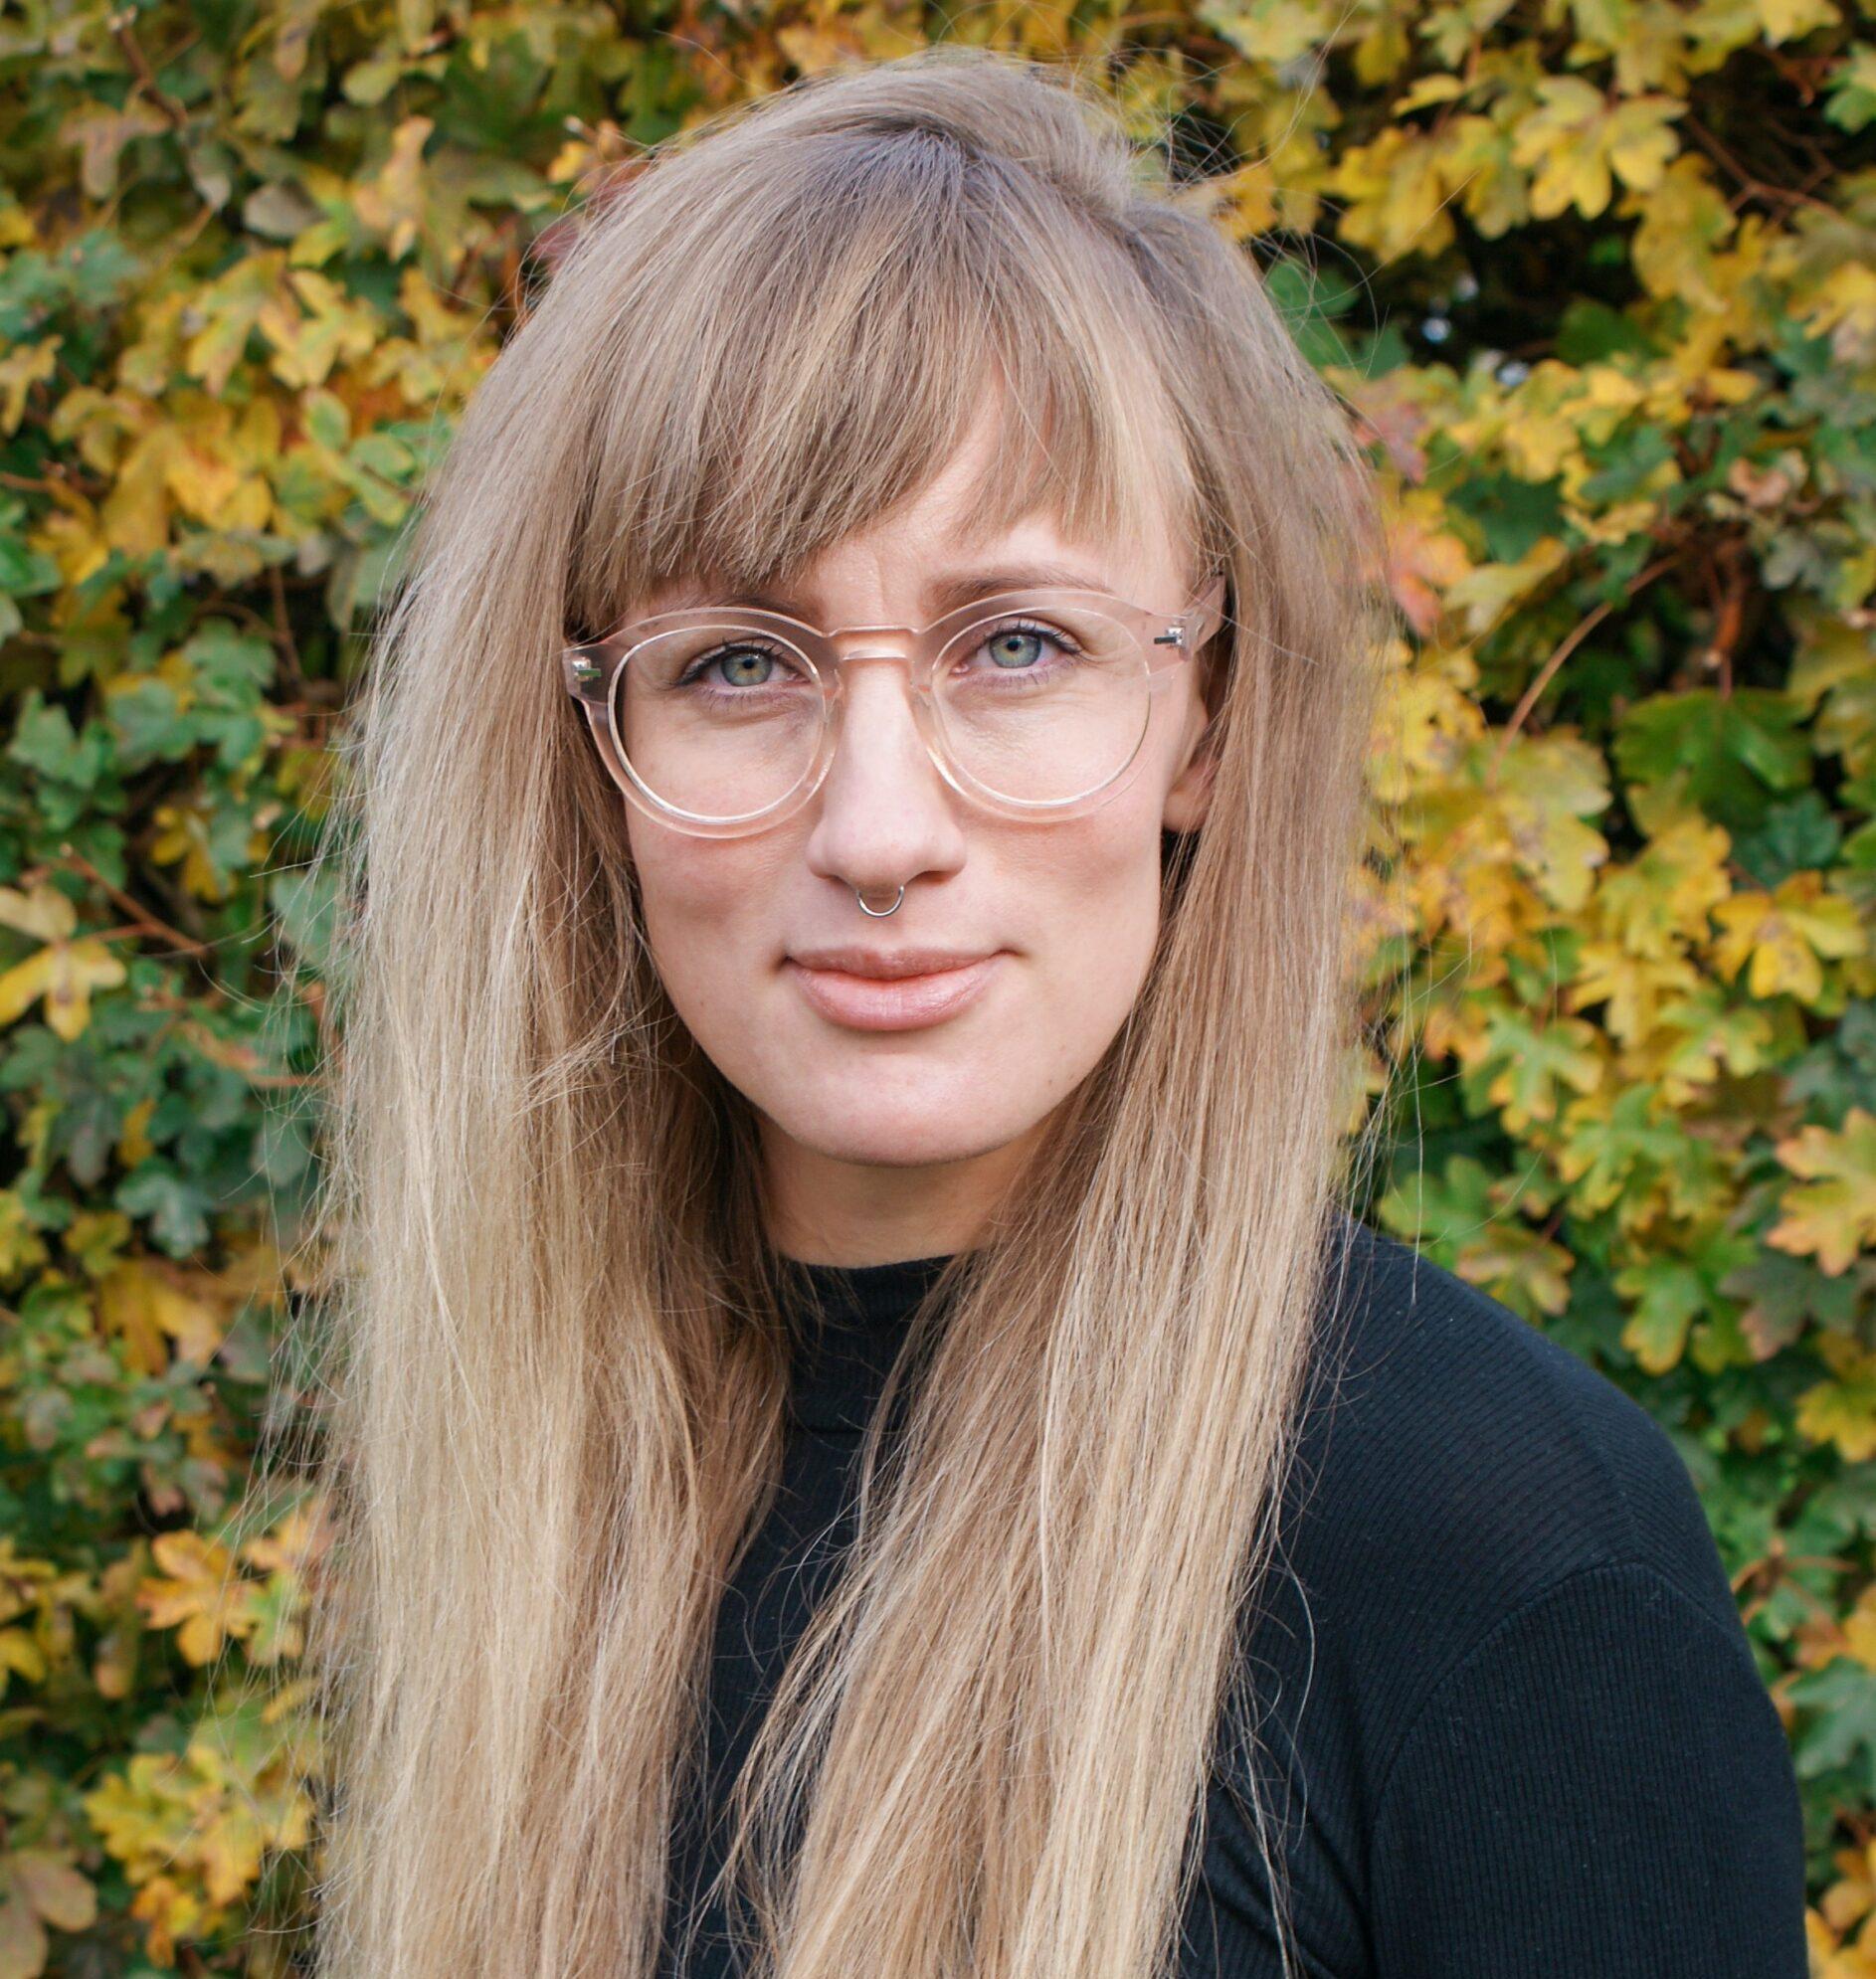 Mai Odgaard Petersen